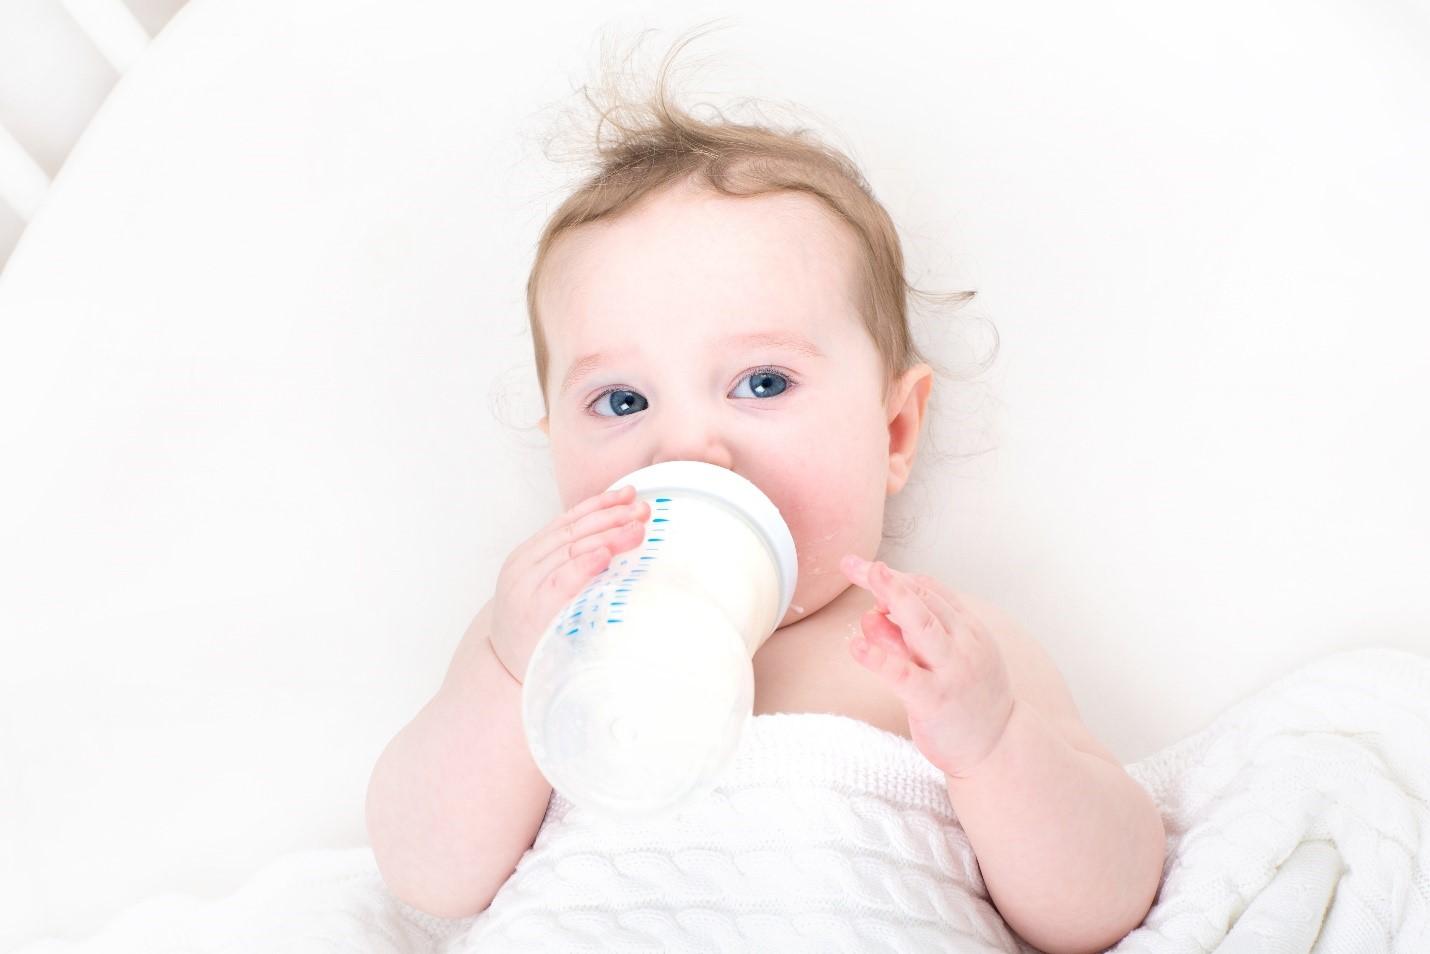 Apa Penyebab Si Kecil Mengalami Intoleransi Laktosa?